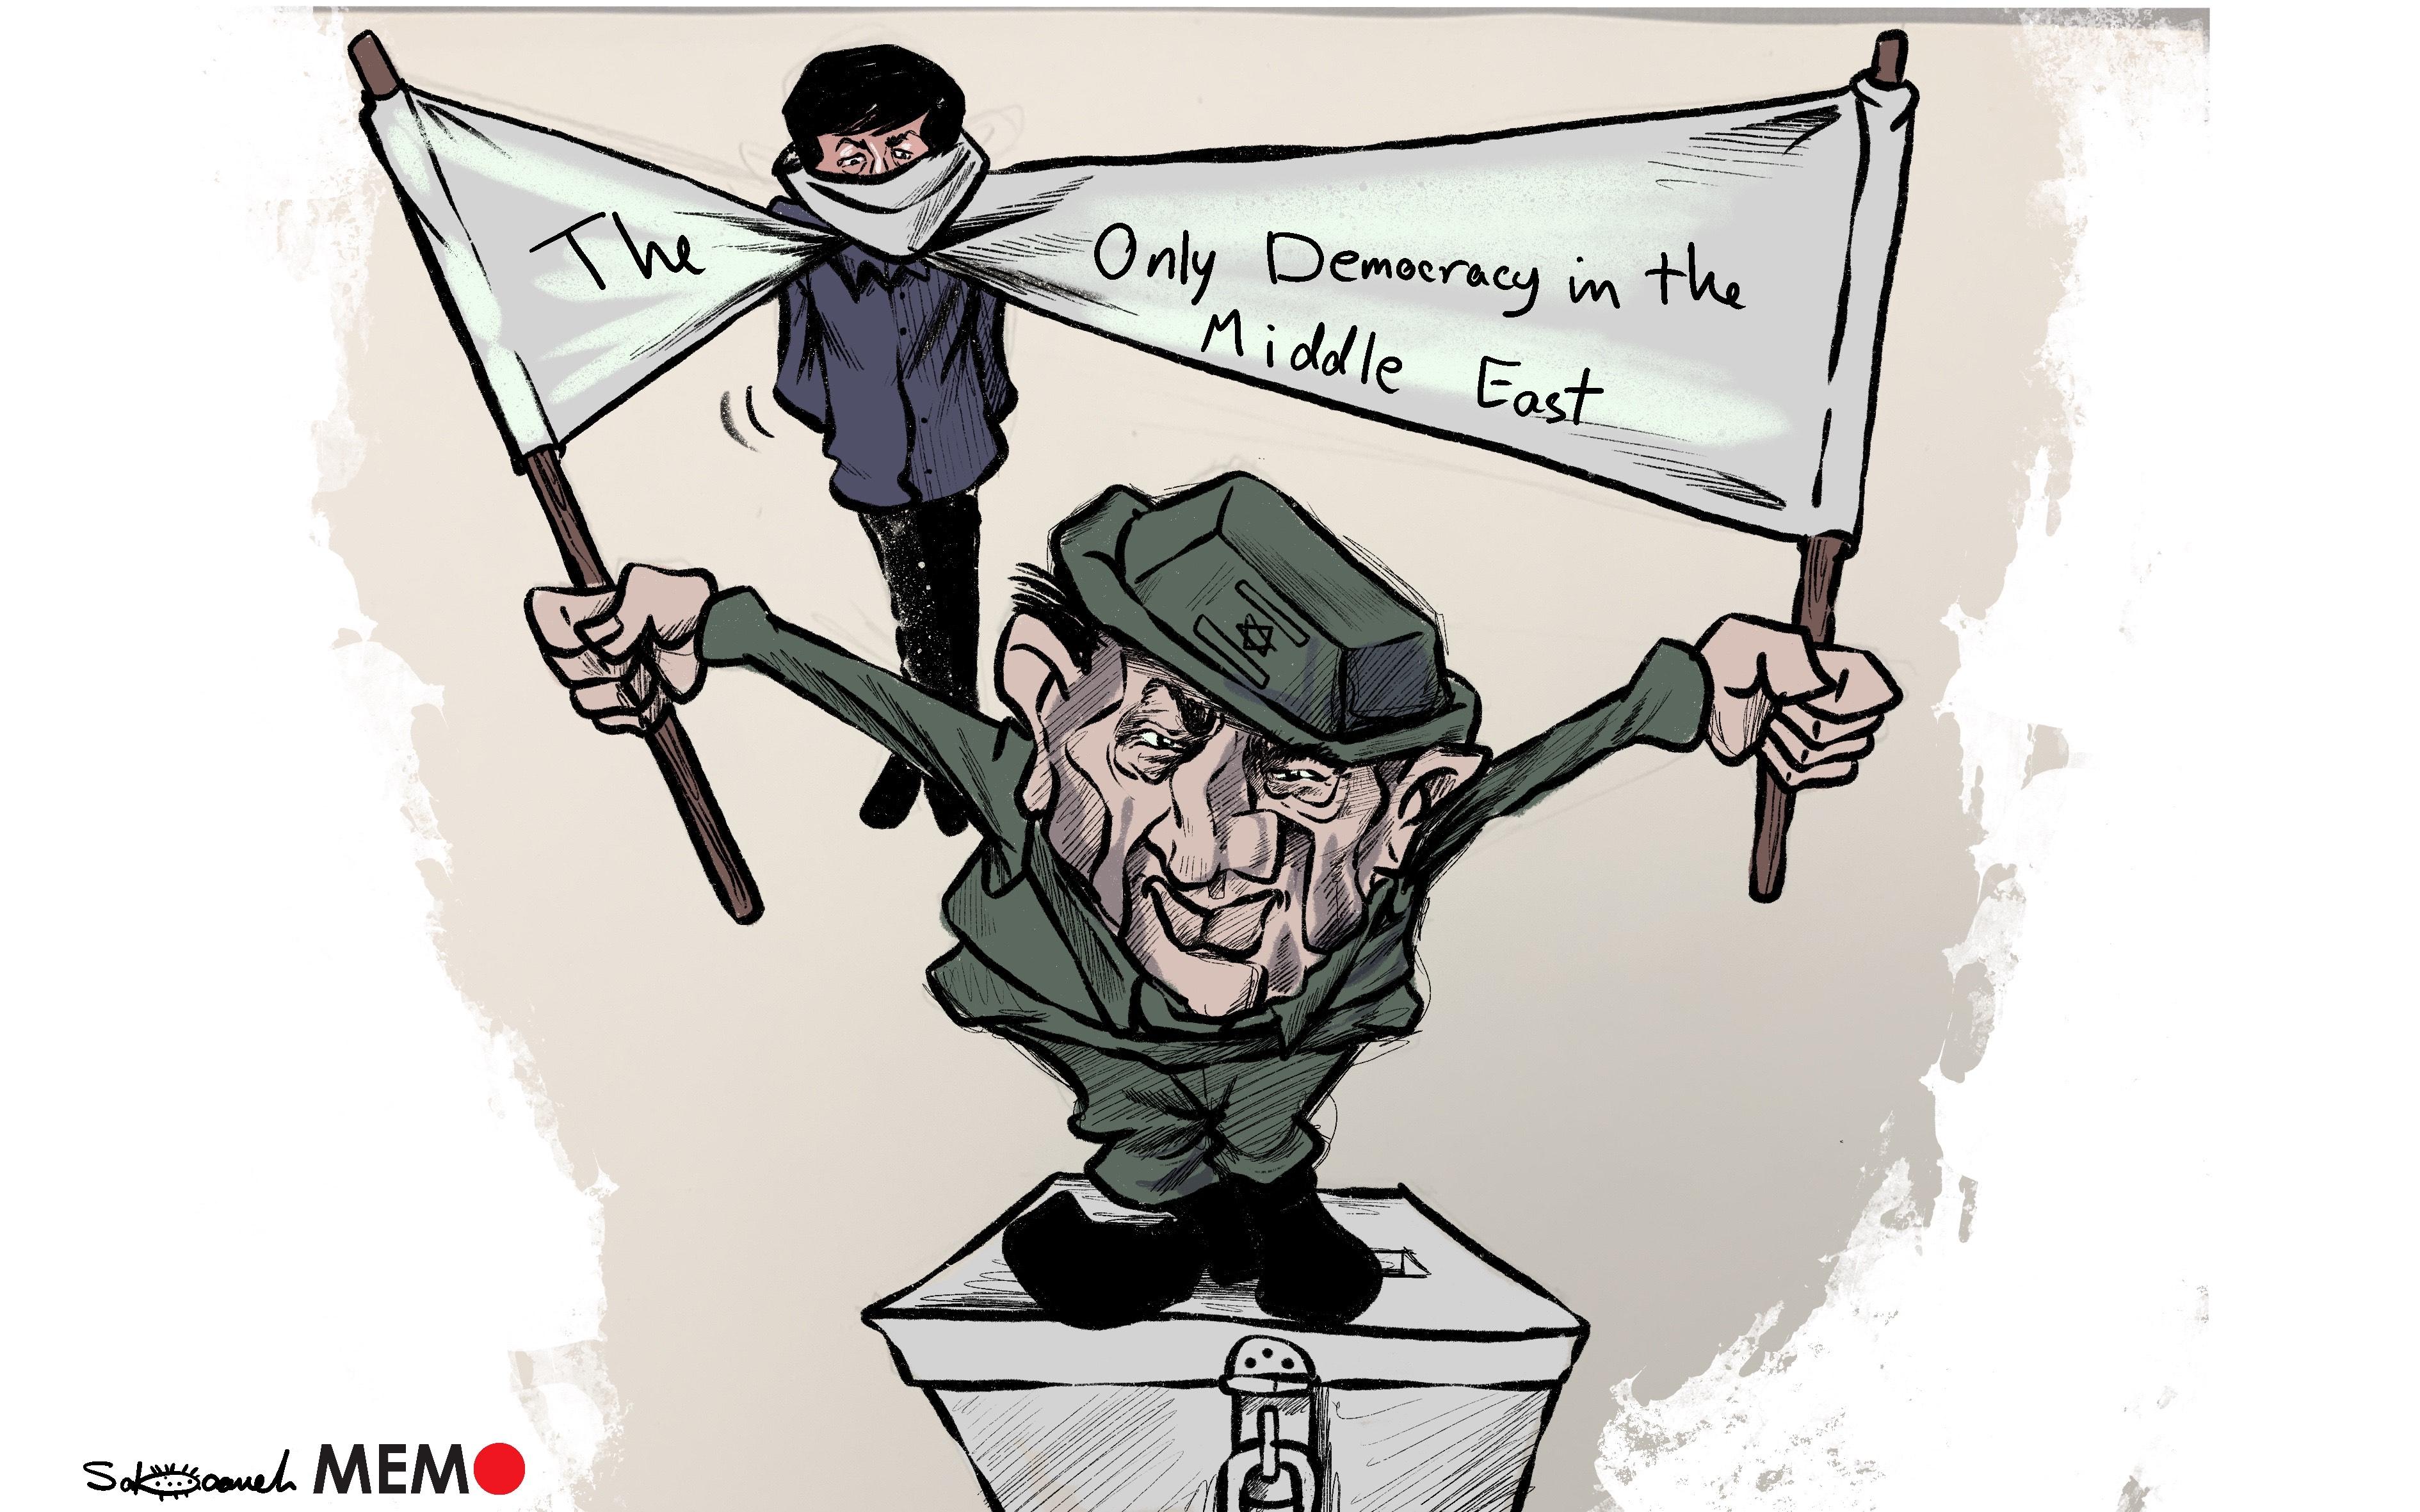 Israel is arresting Hamas members ahead of the election - Cartoon [Sabaaneh/MiddleEastMonitor]